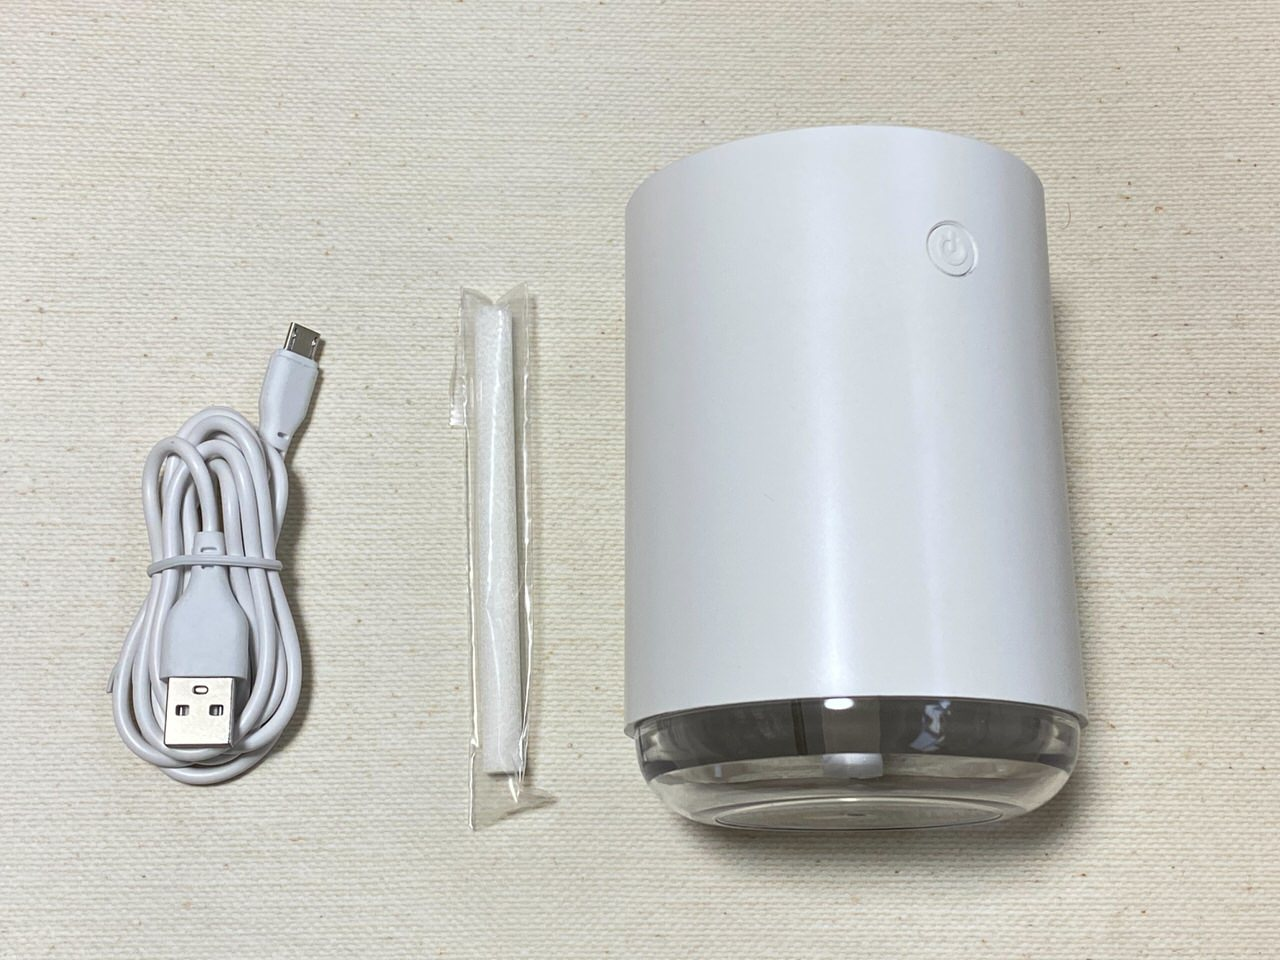 USBで給電するダイソーの500円加湿器を試してみた(円柱型) 4